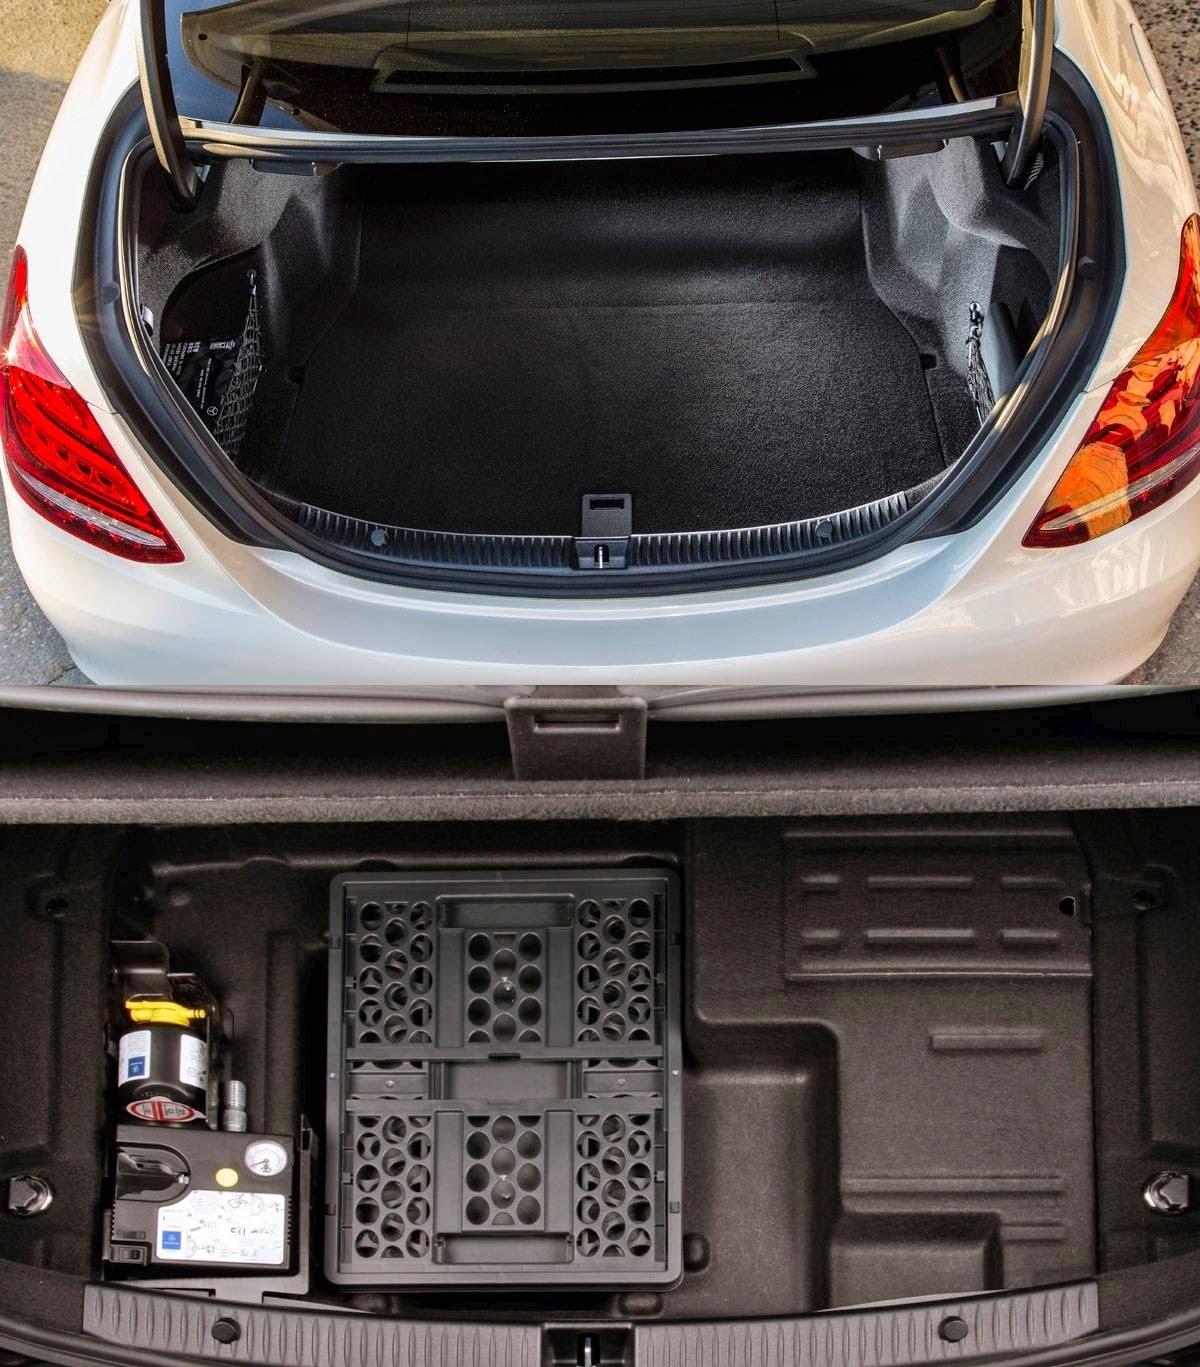 cockpit autom vel conte dos auto ensaio mercedes benz classe c 180 bluetec my 2015. Black Bedroom Furniture Sets. Home Design Ideas